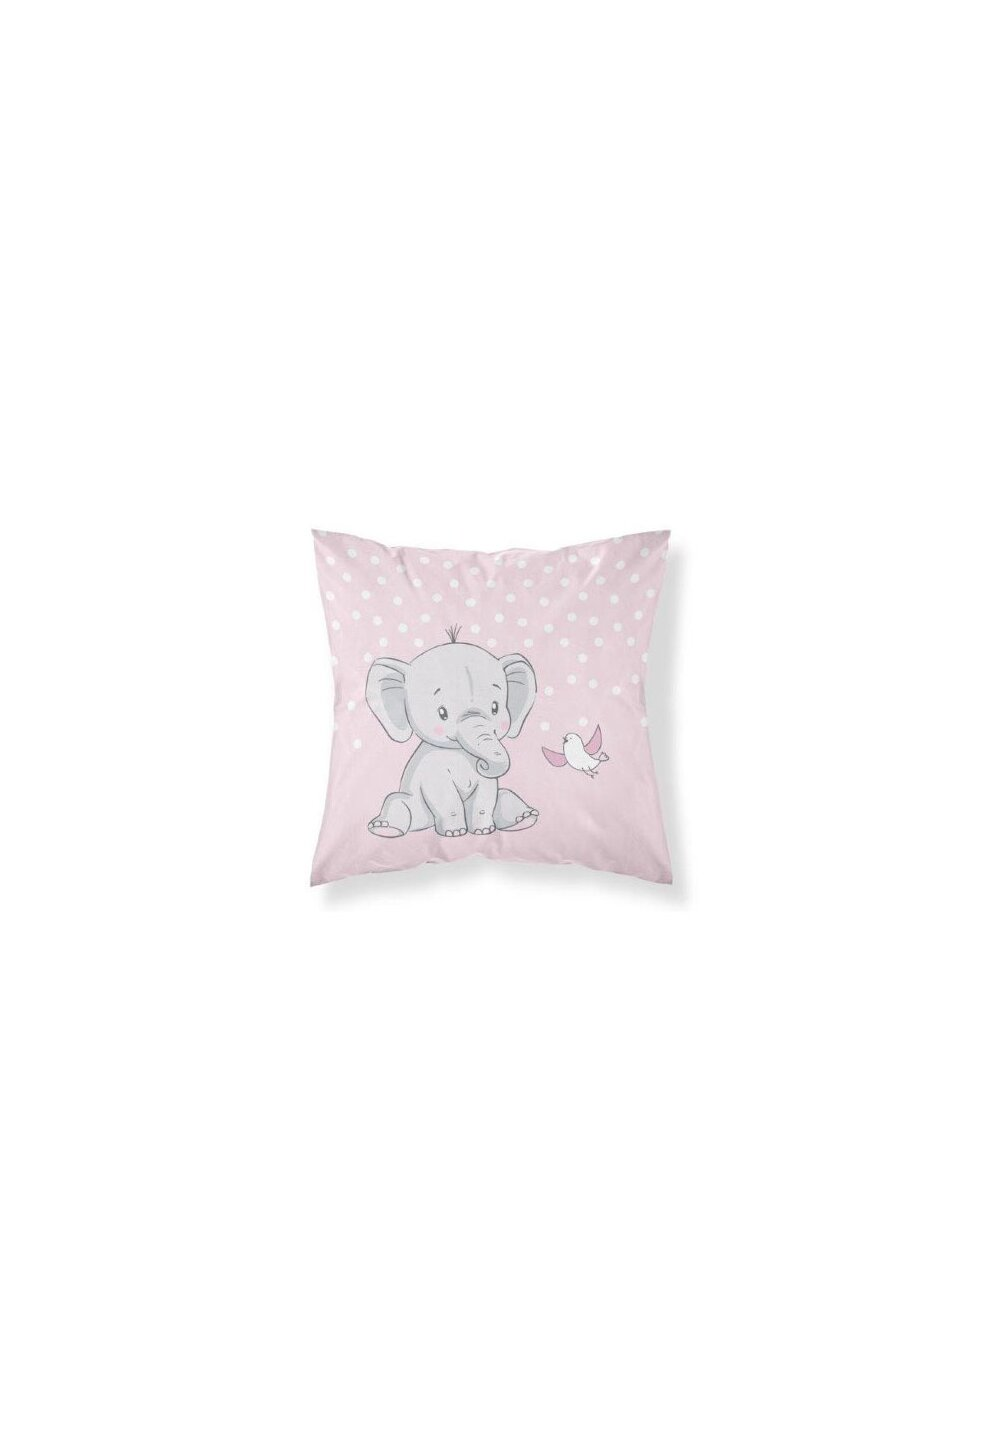 Perna, Sweet dreams, roz, 40x40 cm imagine